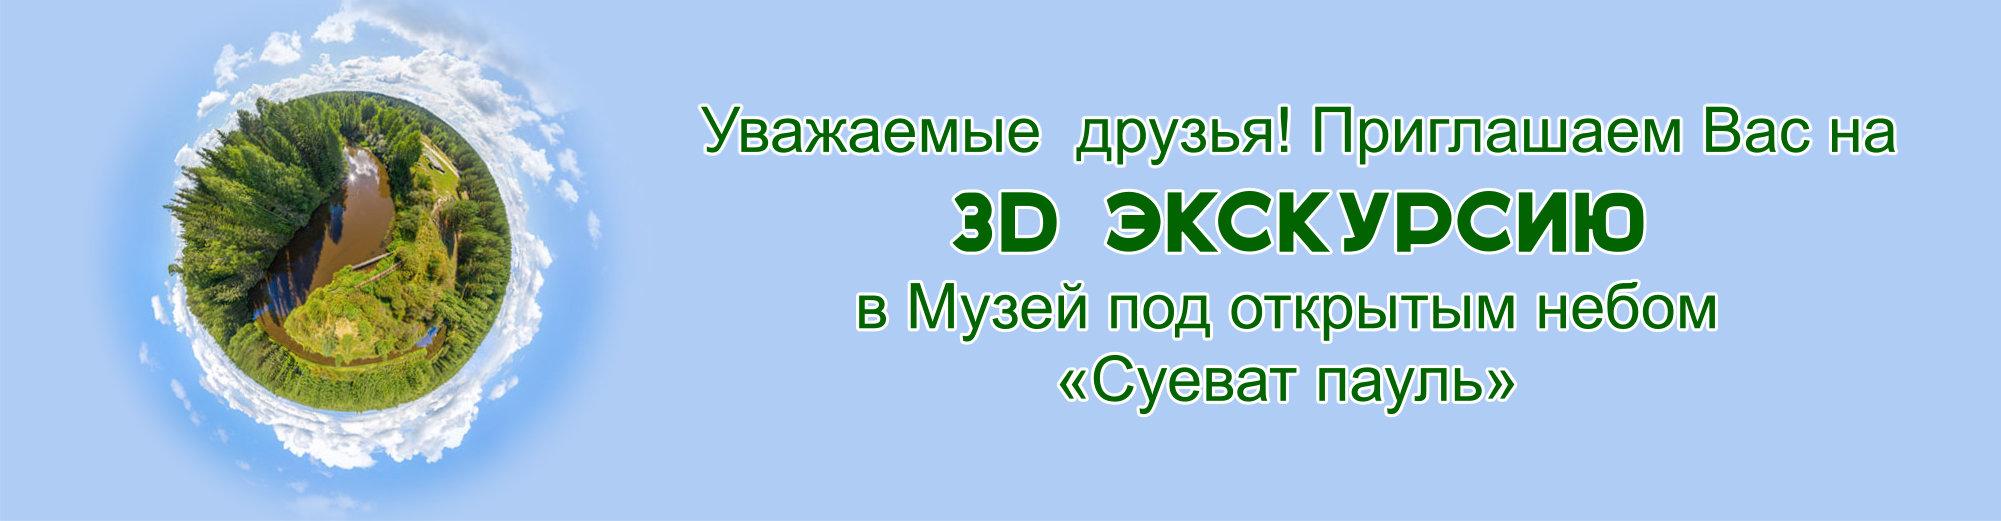 3d_suevat